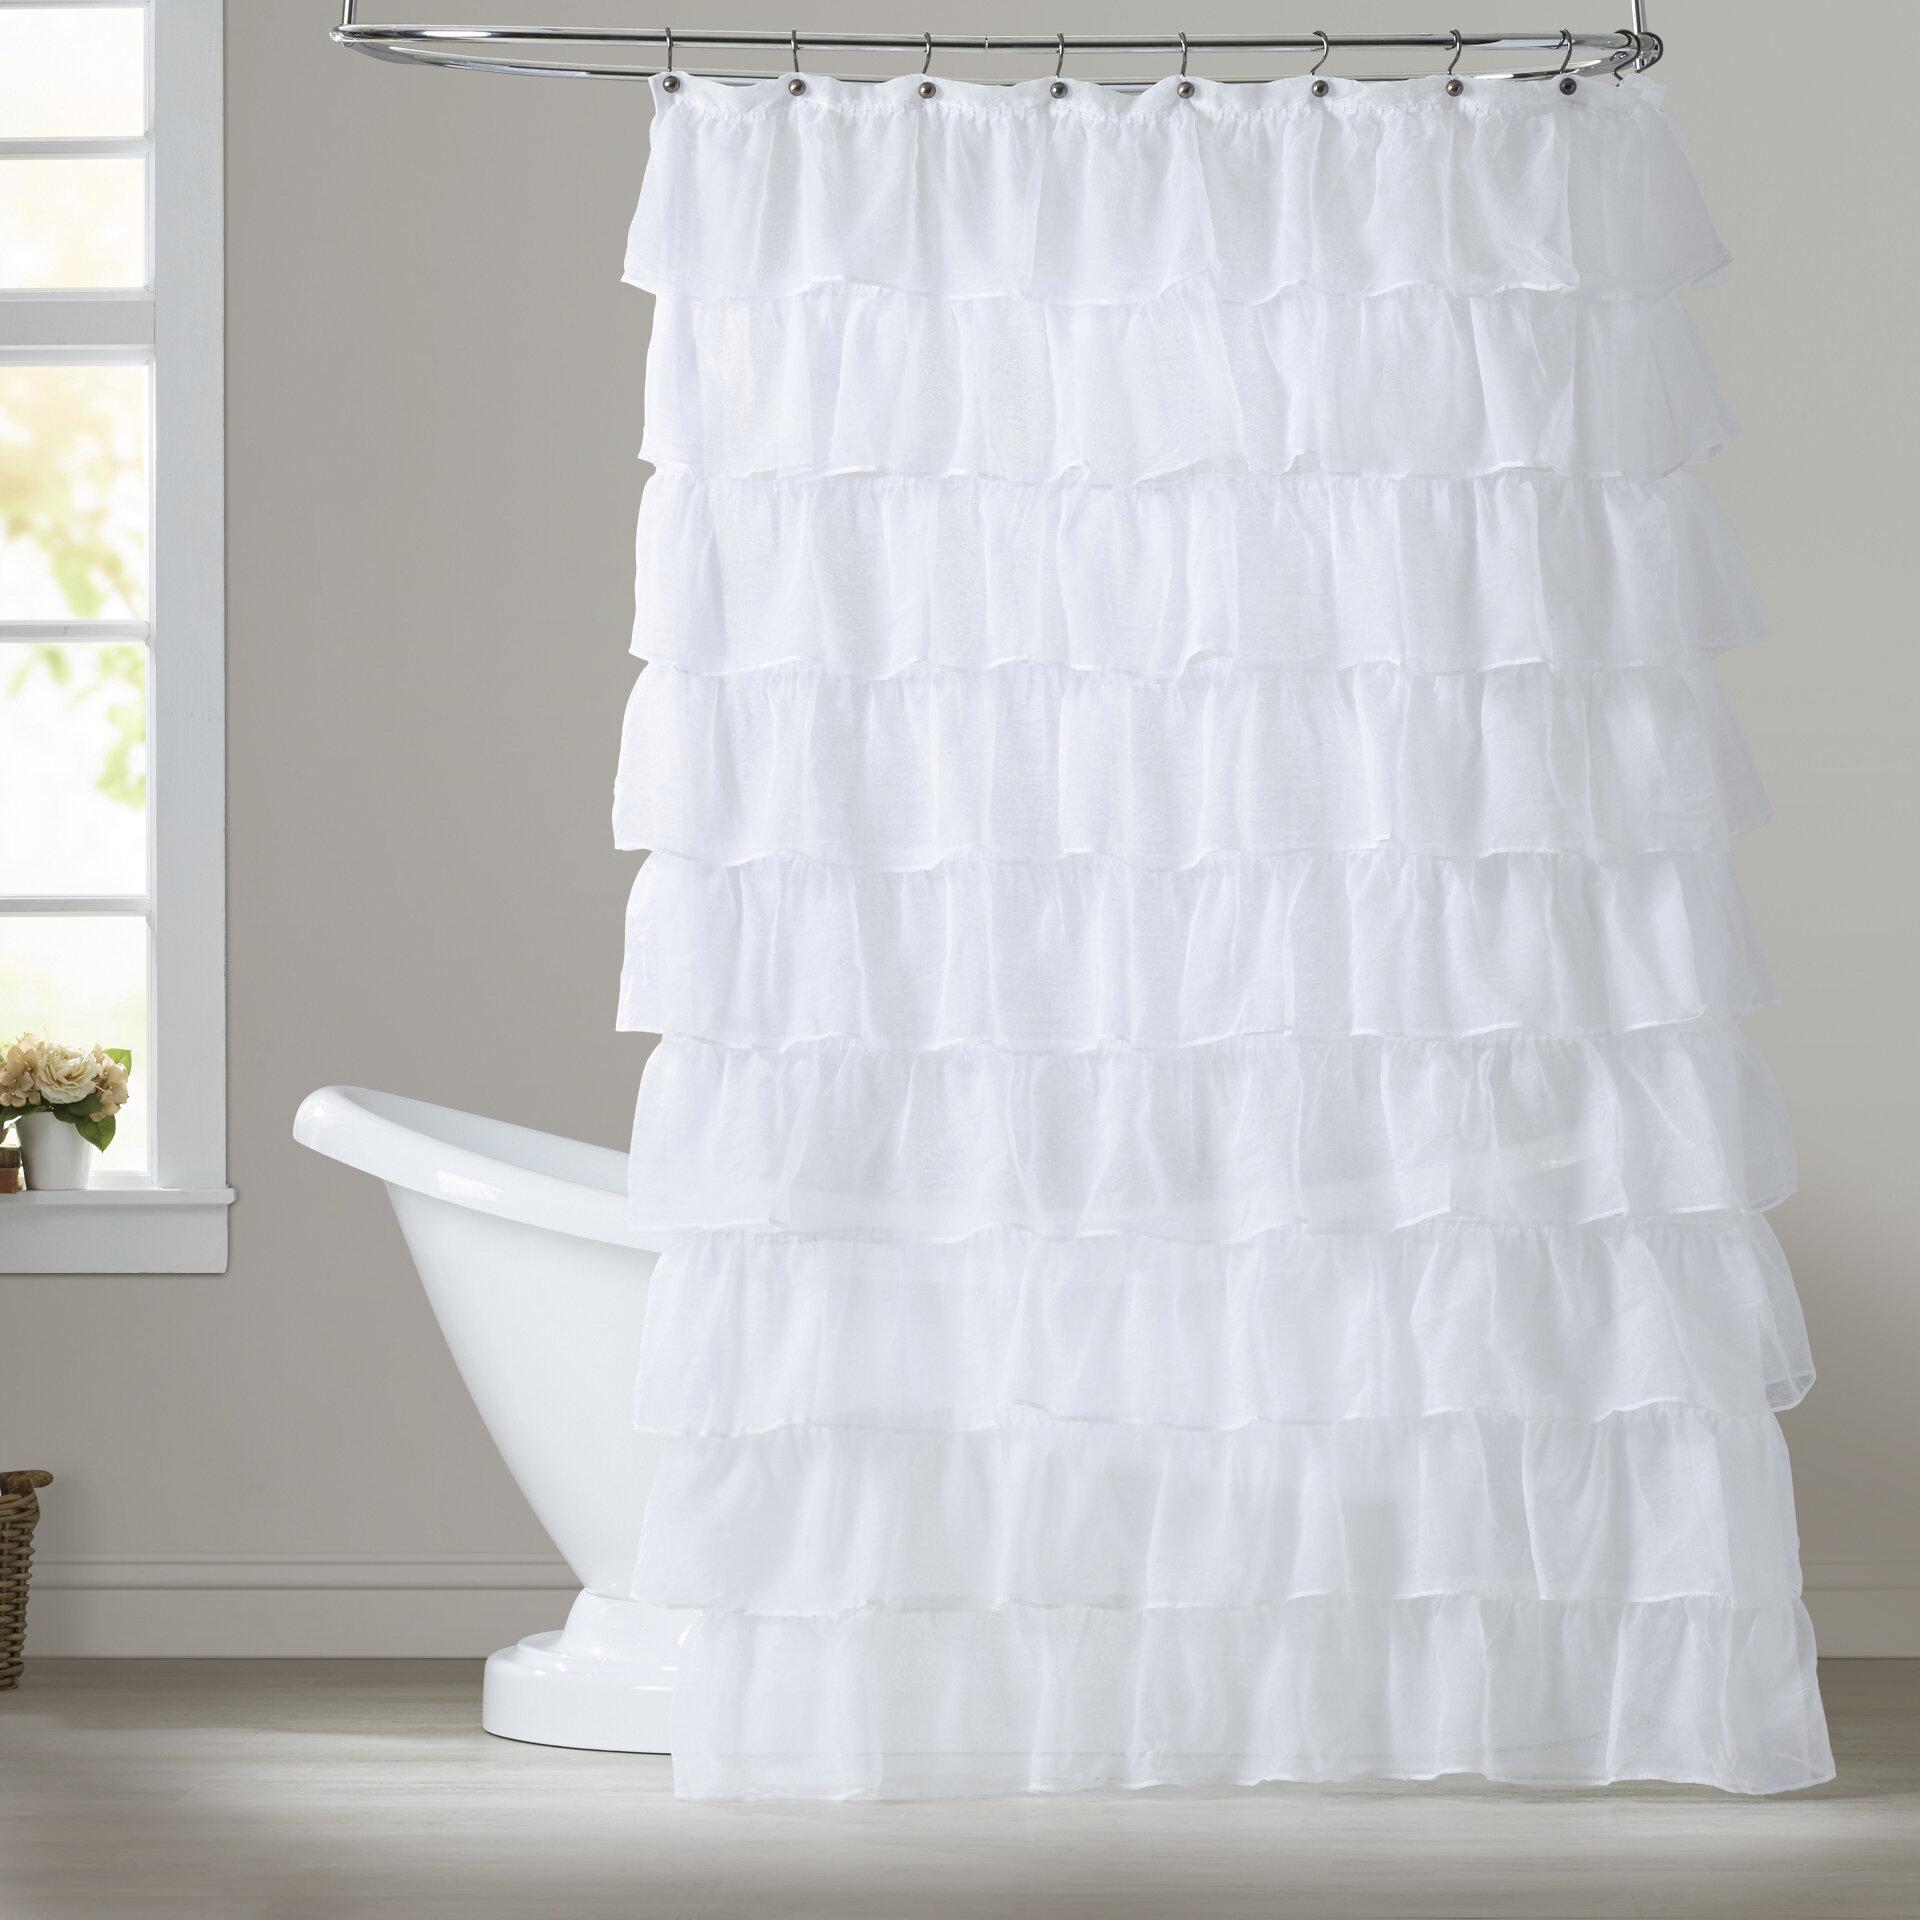 Atia Voile Ruffled Tier Single Shower